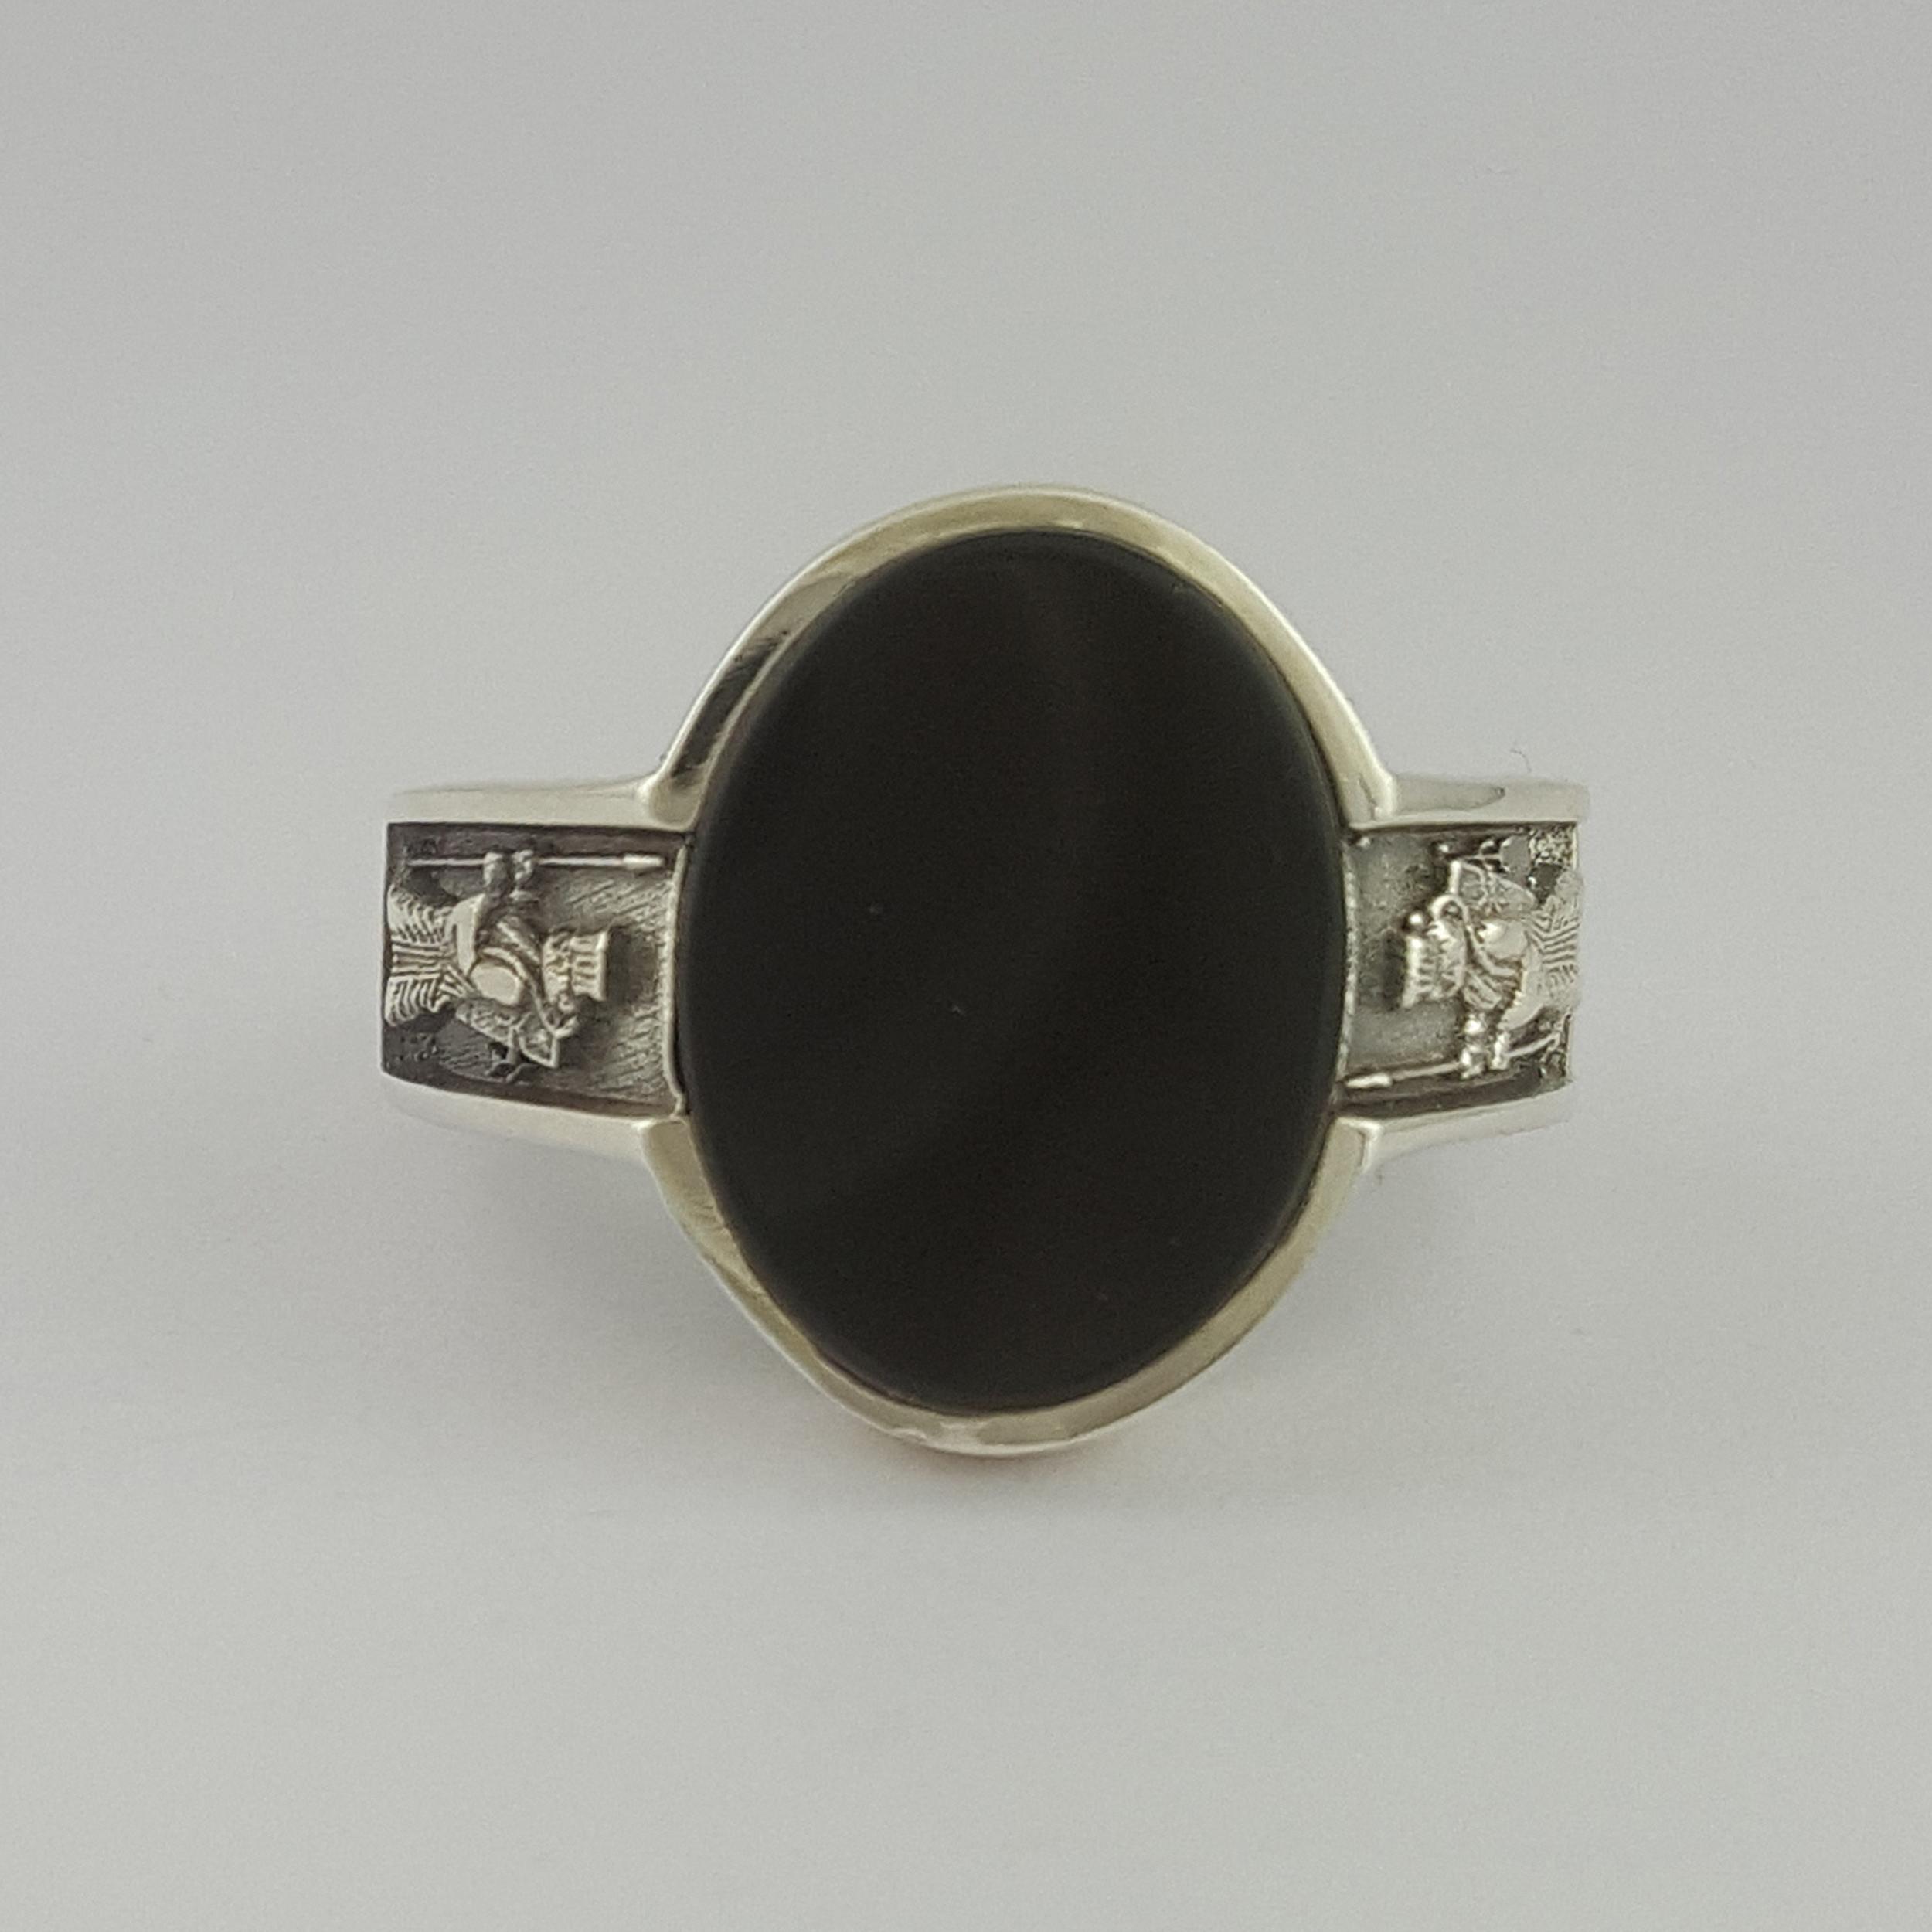 انگشتر نقره مردانه بلو استون کد 1069-63 -  - 5